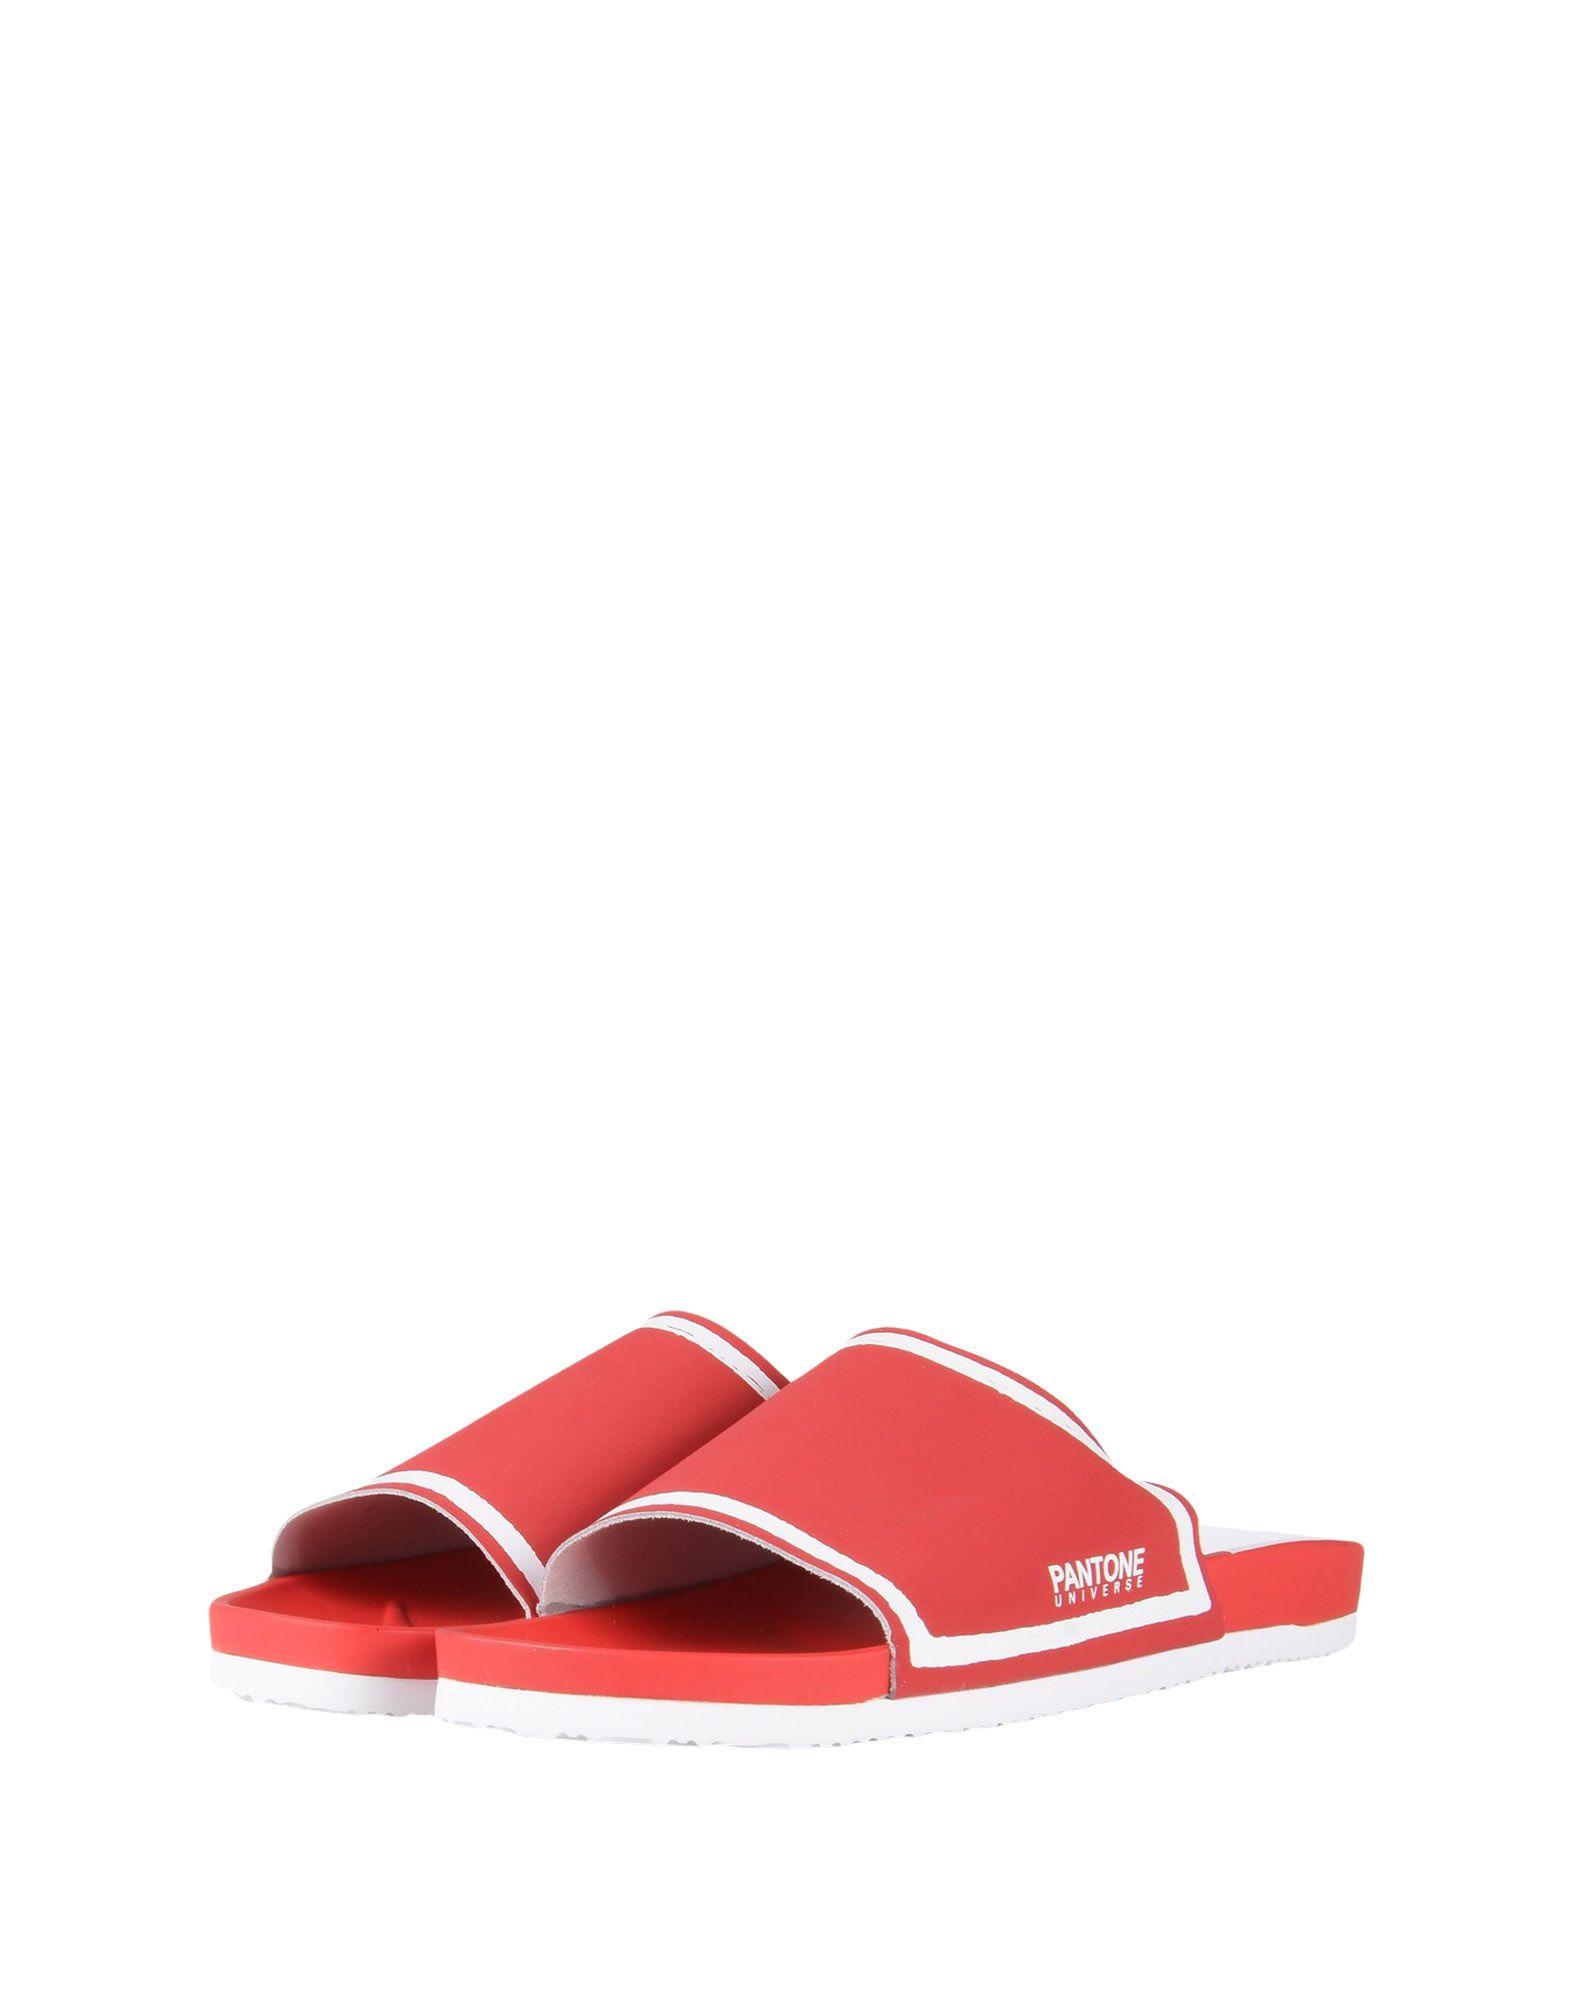 Cuir Ibiza - Chaussures - Sandales Pantone rdGQu